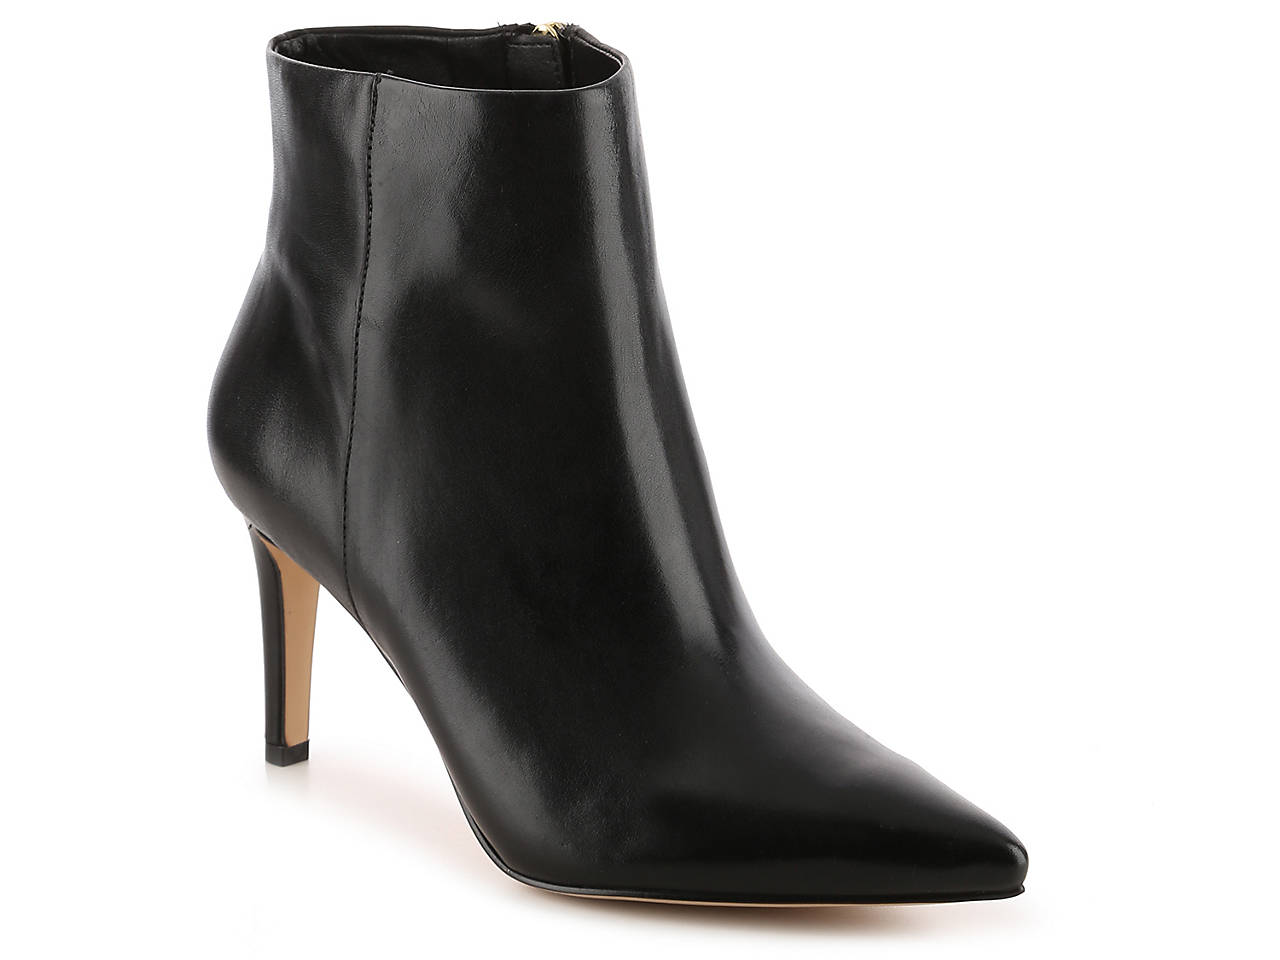 c4c4ad8fc74 Sam Edelman Karen Bootie Women s Shoes